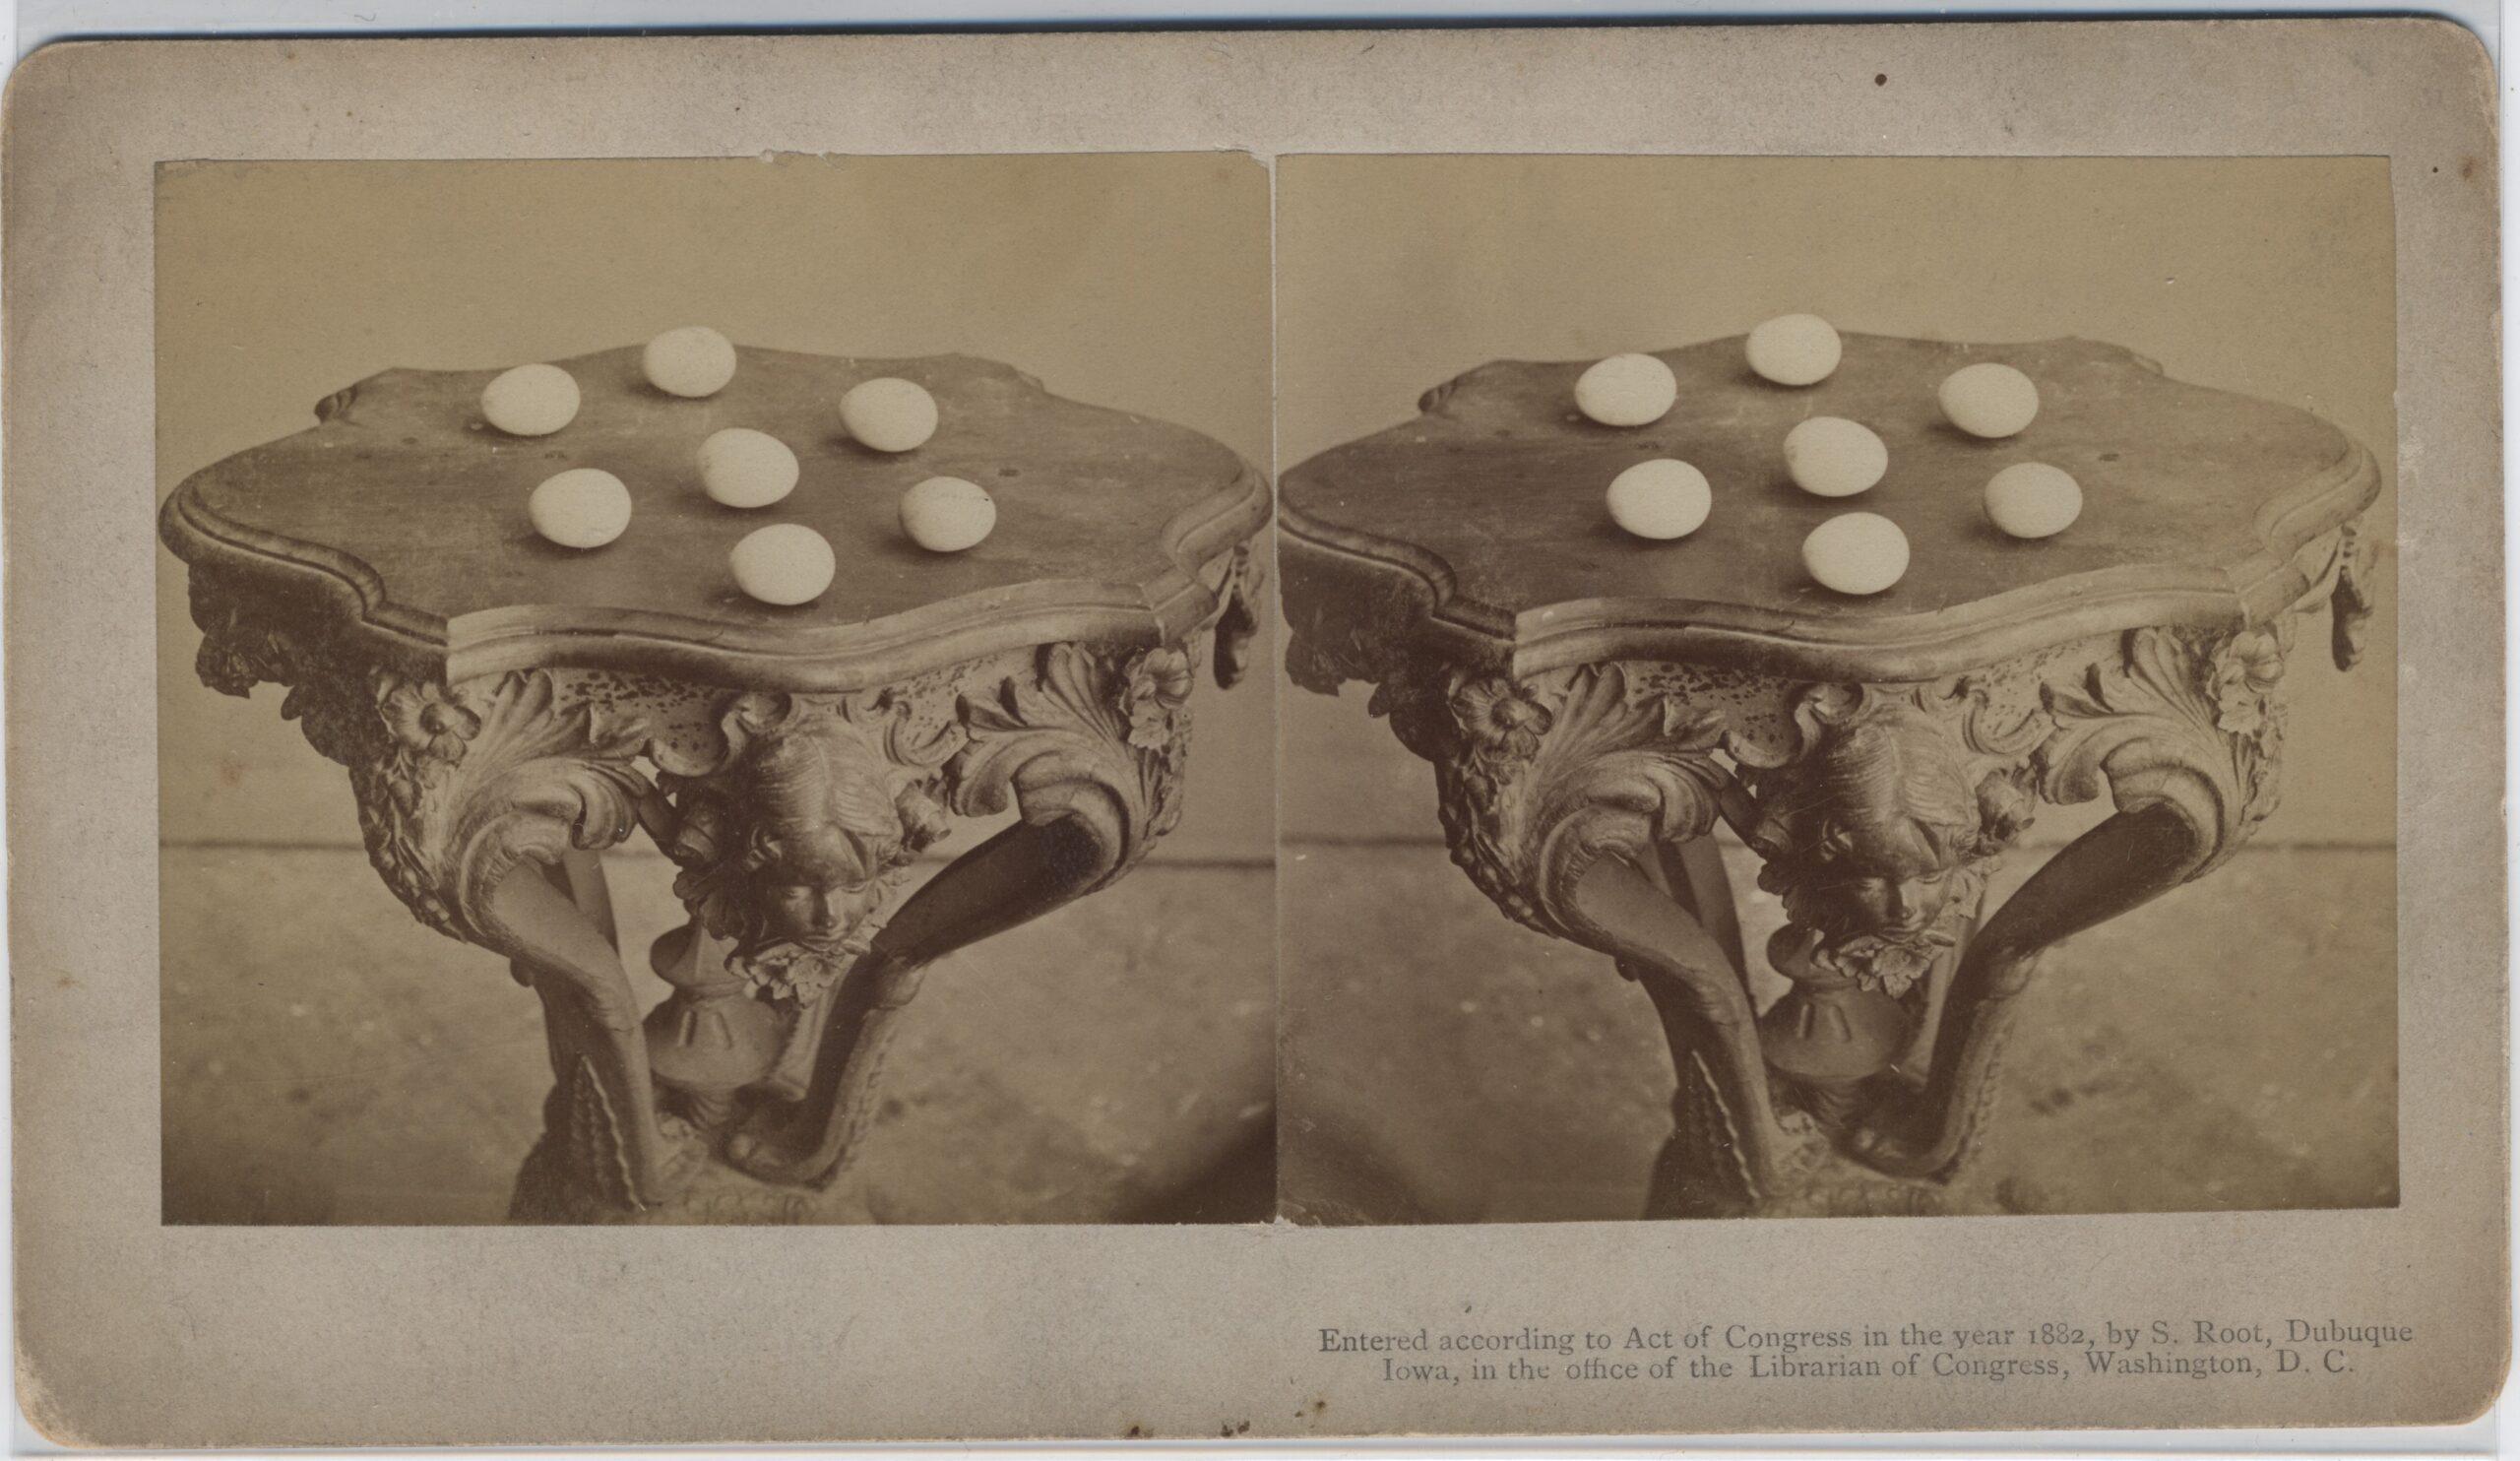 LJTP 100.321 - S. Root - Eggs - Jun 1882